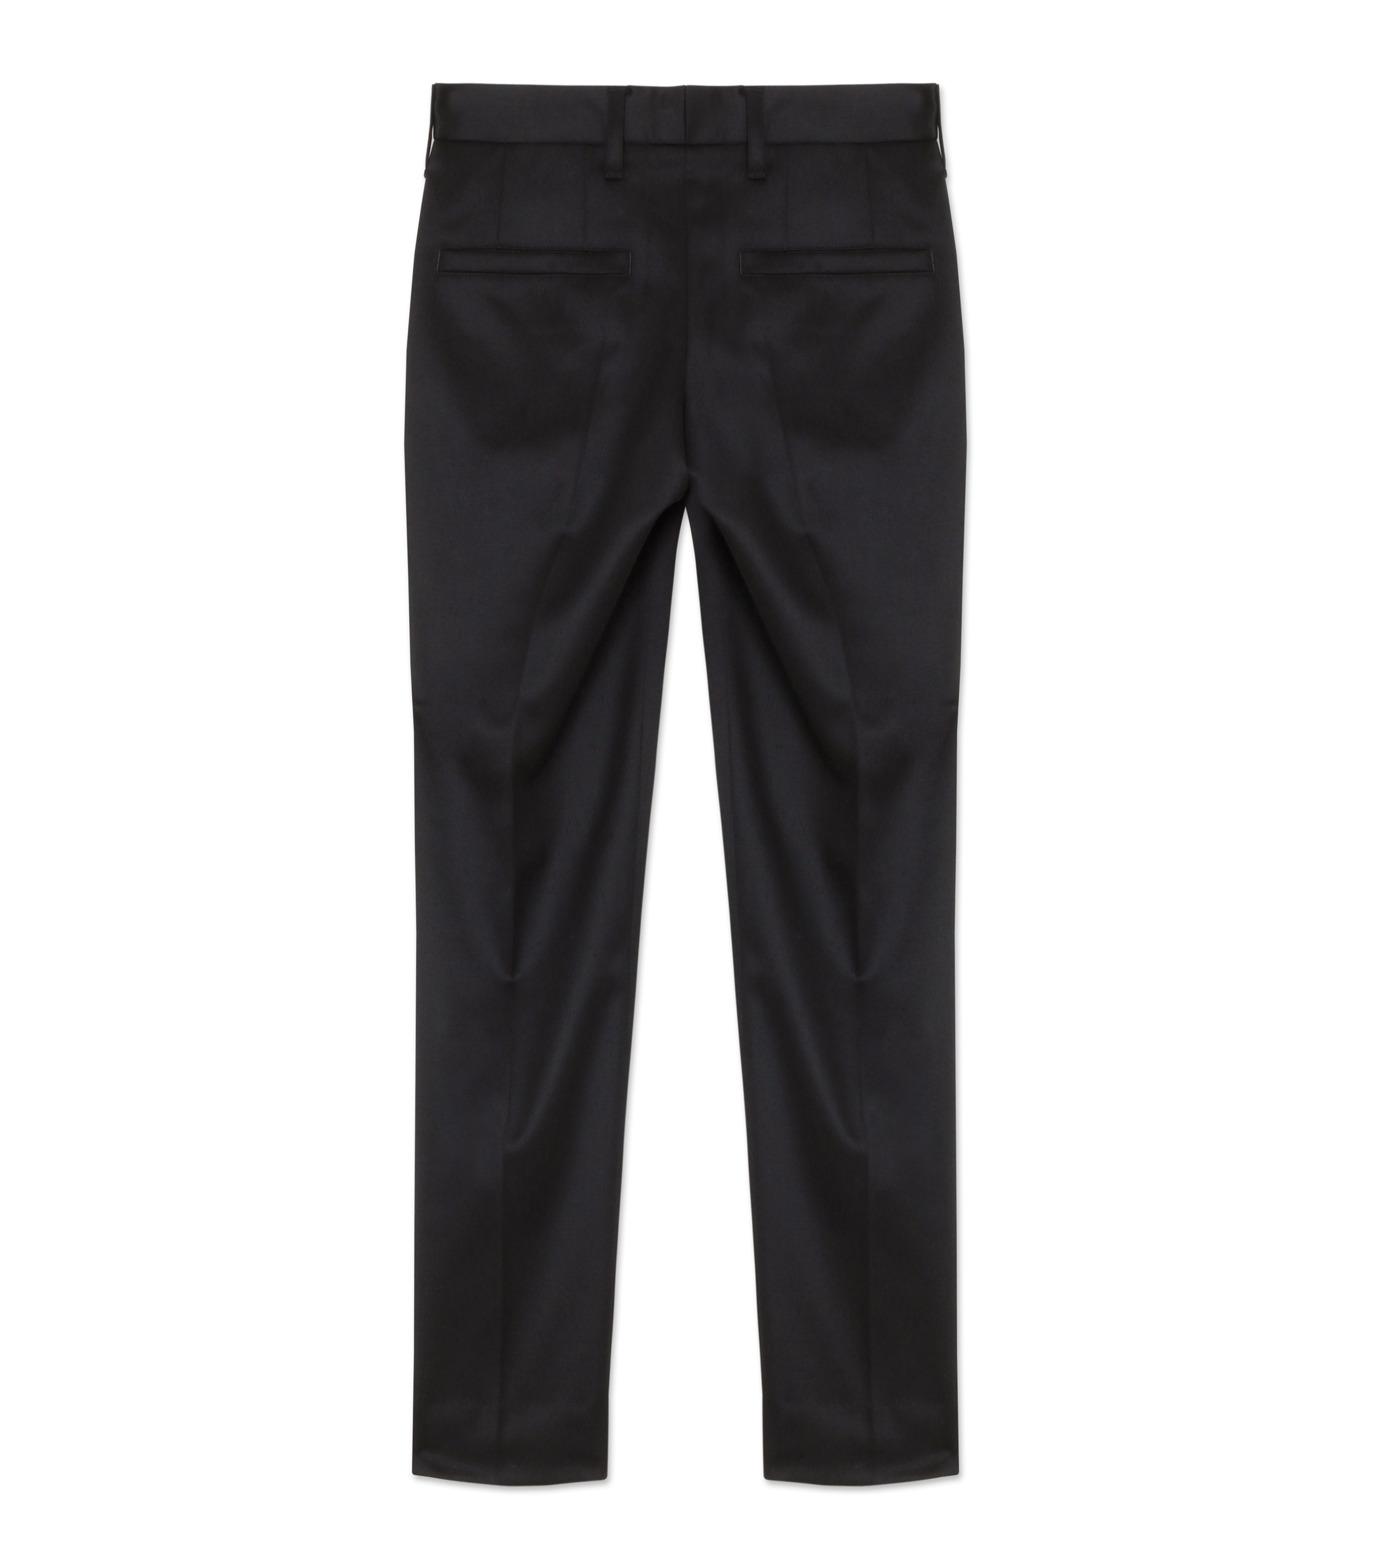 liberum arbitrium(リベルム アルビトリウム)のSatin Skinny Slacks-BLACK(パンツ/pants)-2016AW-PT01-13 拡大詳細画像2